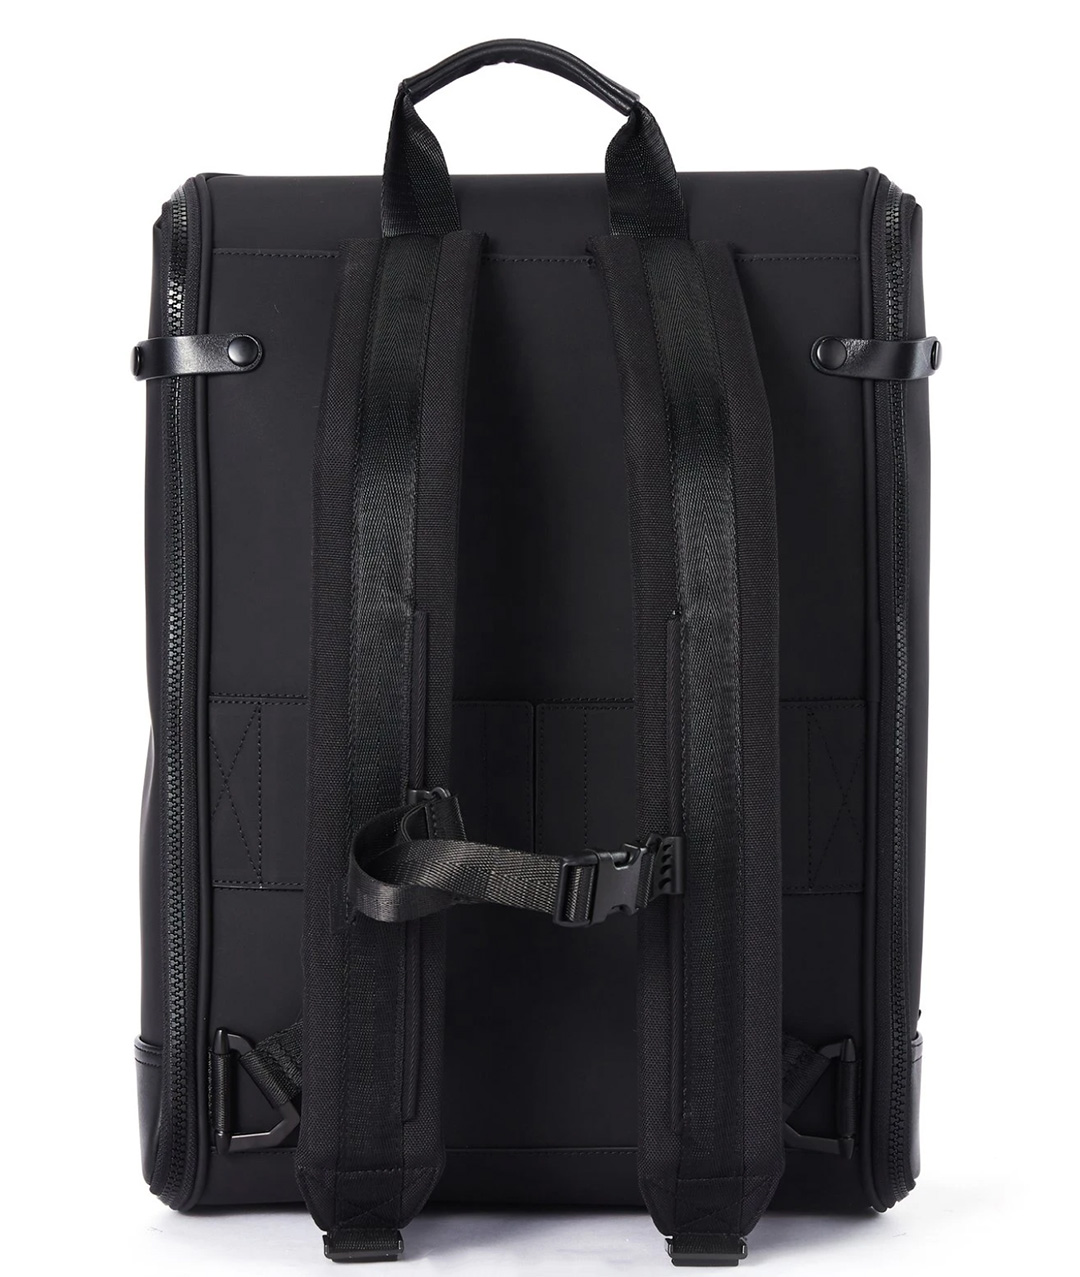 CAPTAIN机长背包系列全开拉链设计 Frequent Flyer打破背包界限